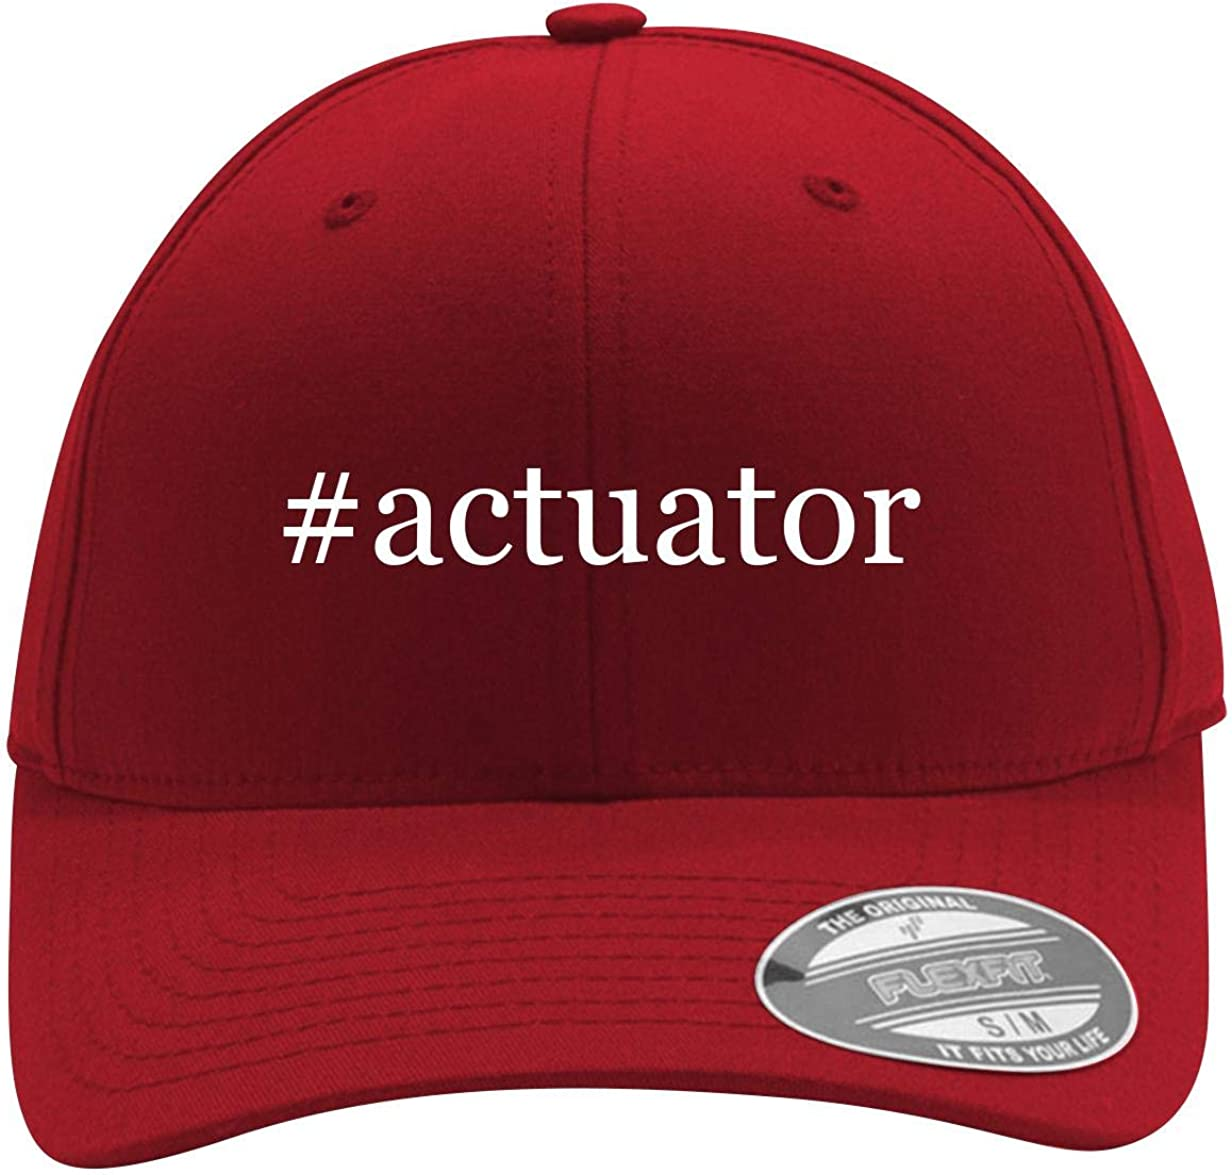 #Actuator - Men's Hashtag Flexfit Baseball Cap Hat 61GsdzNP3hL